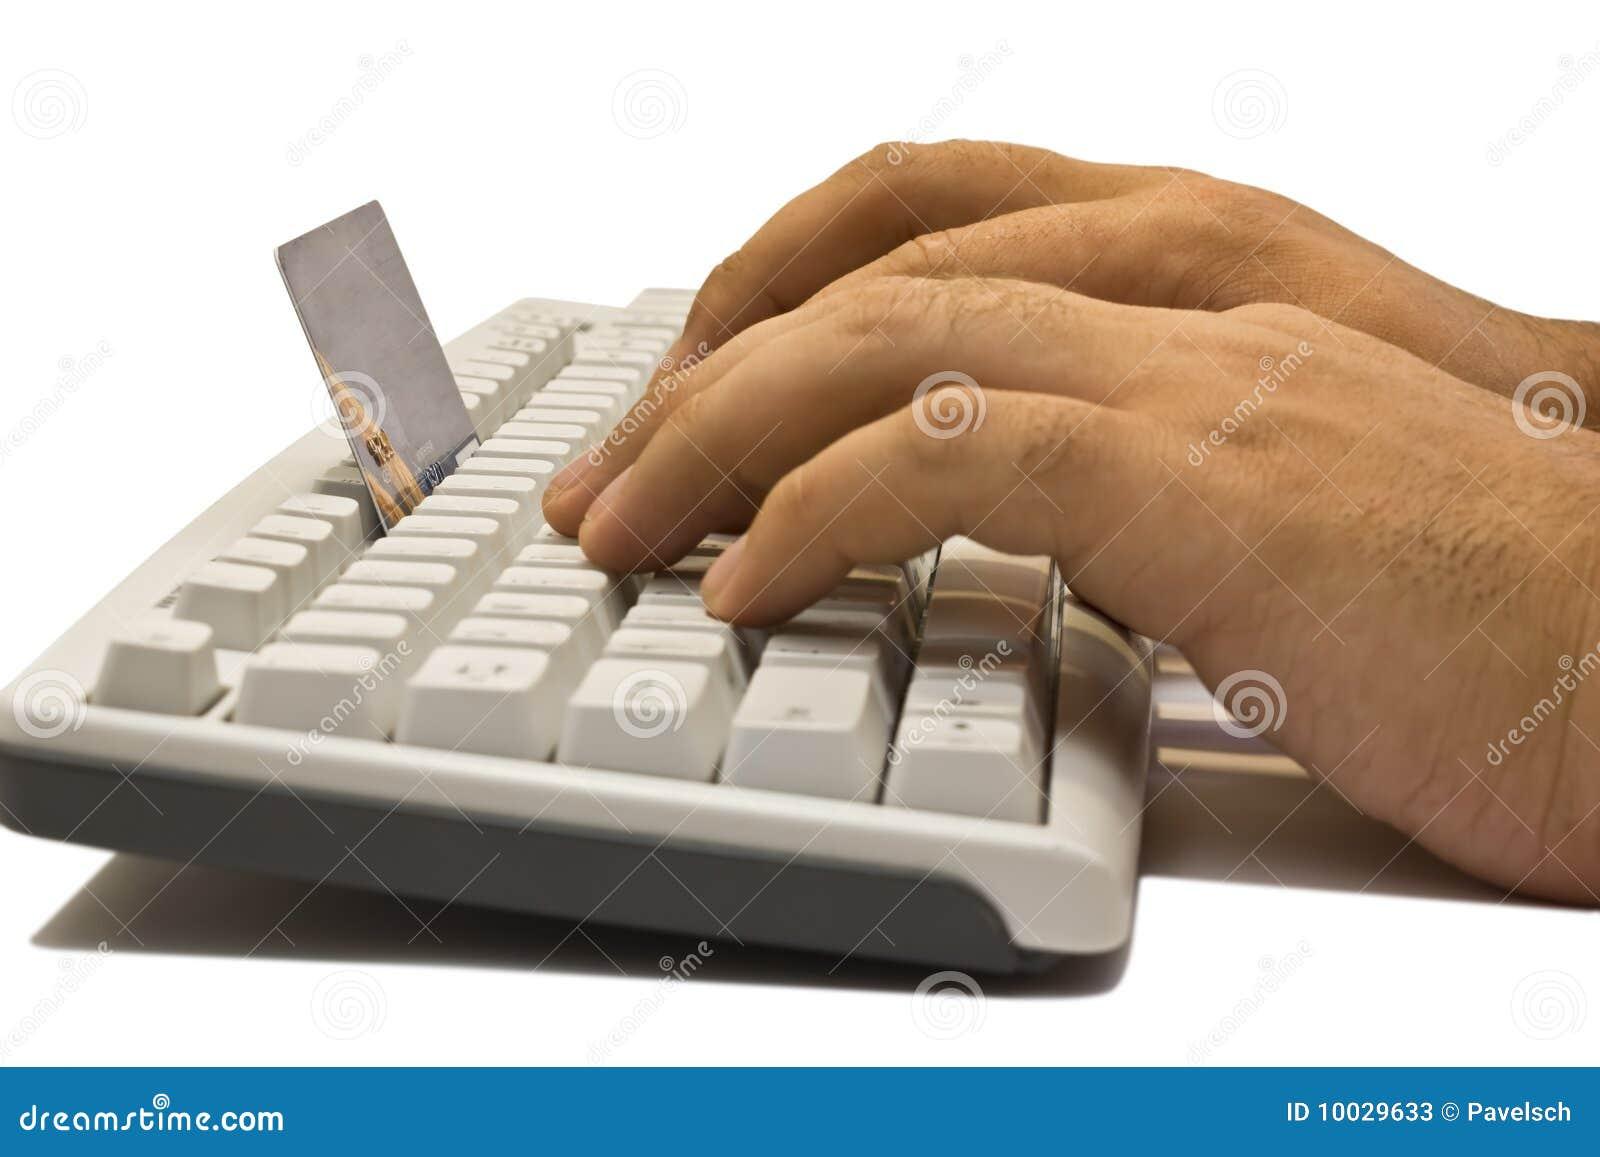 Electronic Commerce (e-commerce)